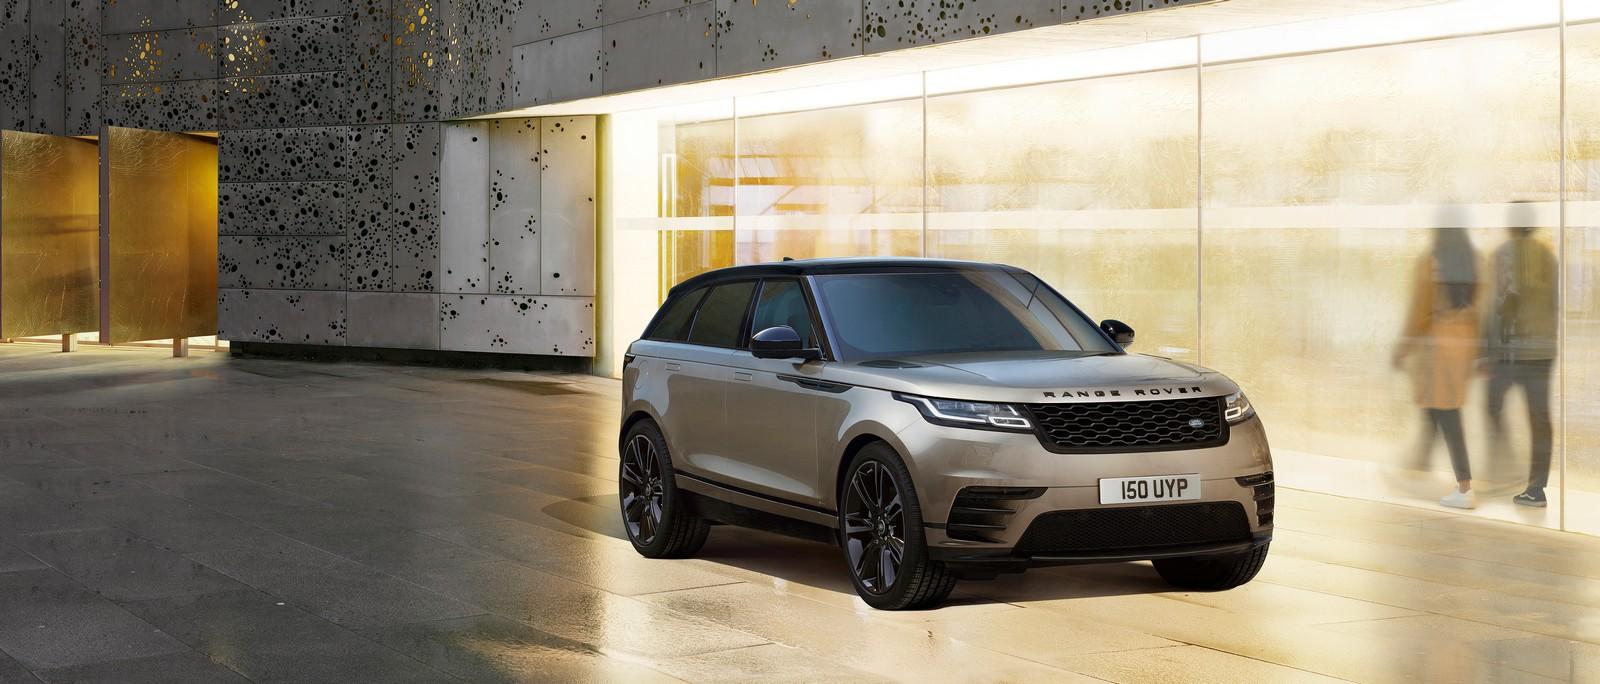 Range Rover Velar Hibrido 25